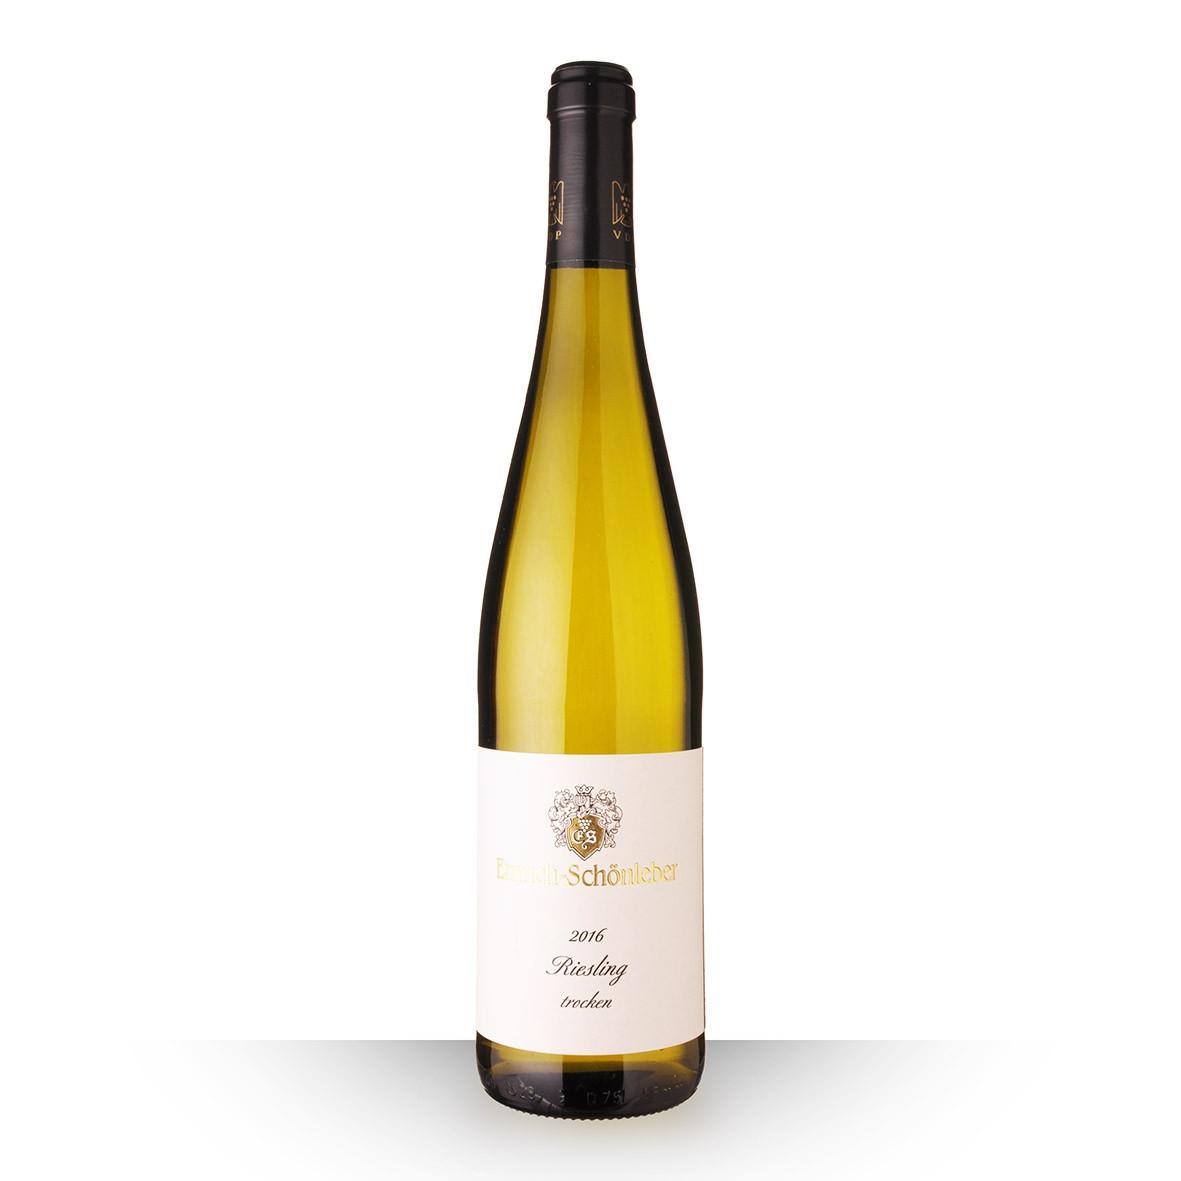 Emrich-Shöenleber Riesling Trocken Blanc 2016 75cl www.odyssee-vins.com